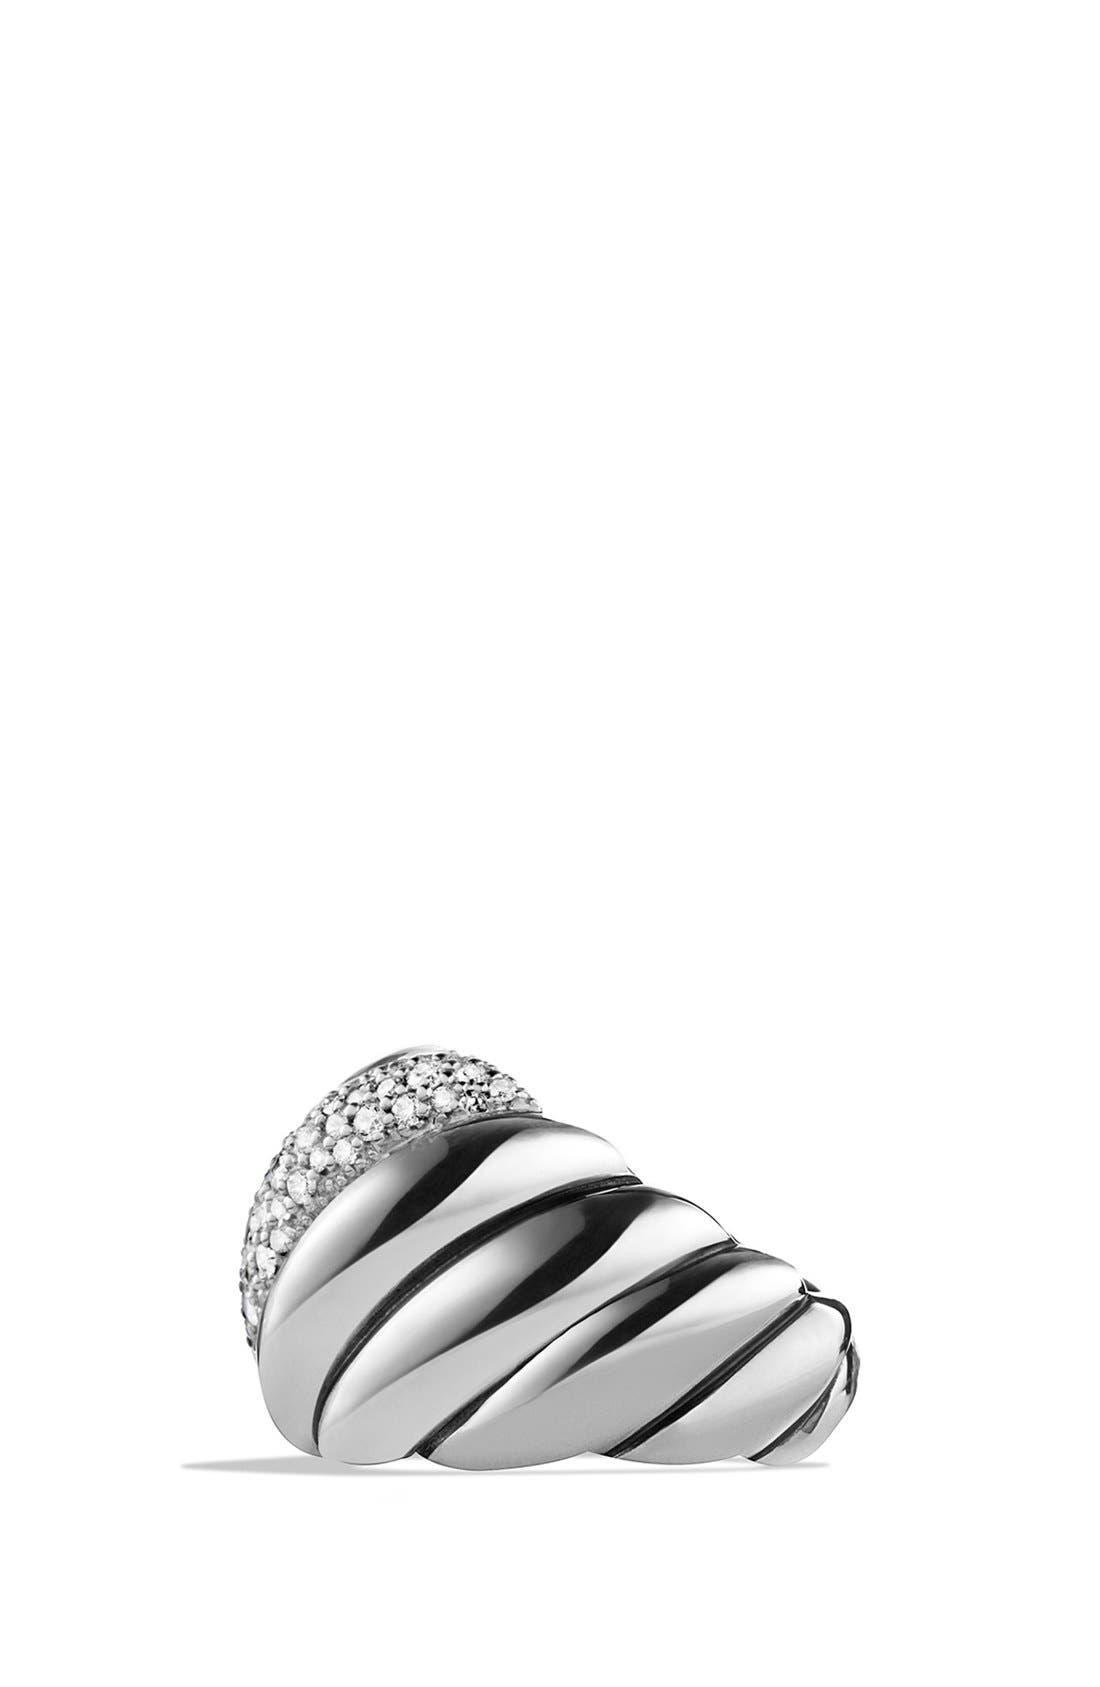 'Hampton Cable' Ring with Diamonds,                             Alternate thumbnail 3, color,                             Diamond